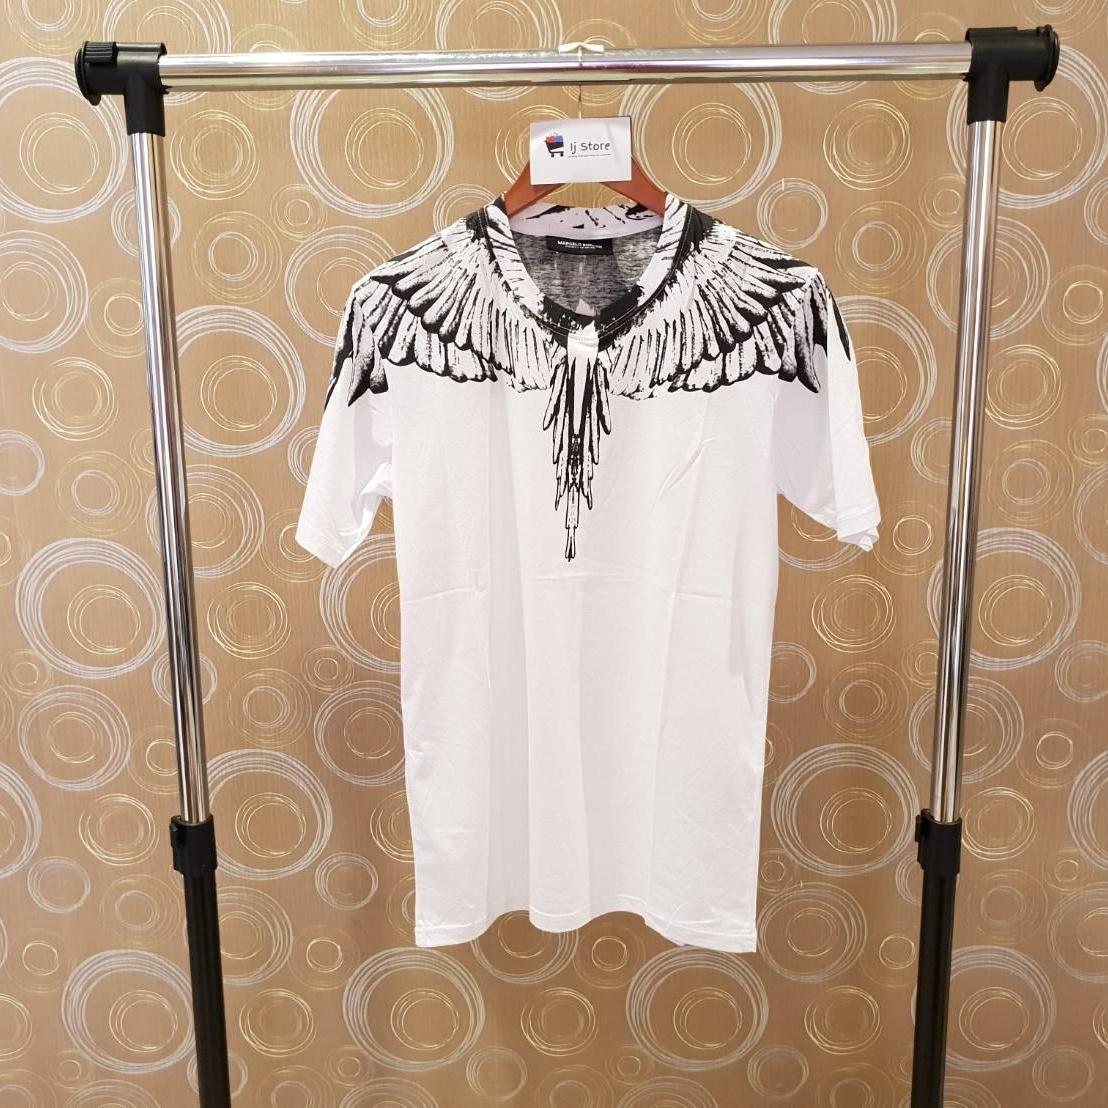 Kaos marcelo burlon black wing import distro high quality putih unisex